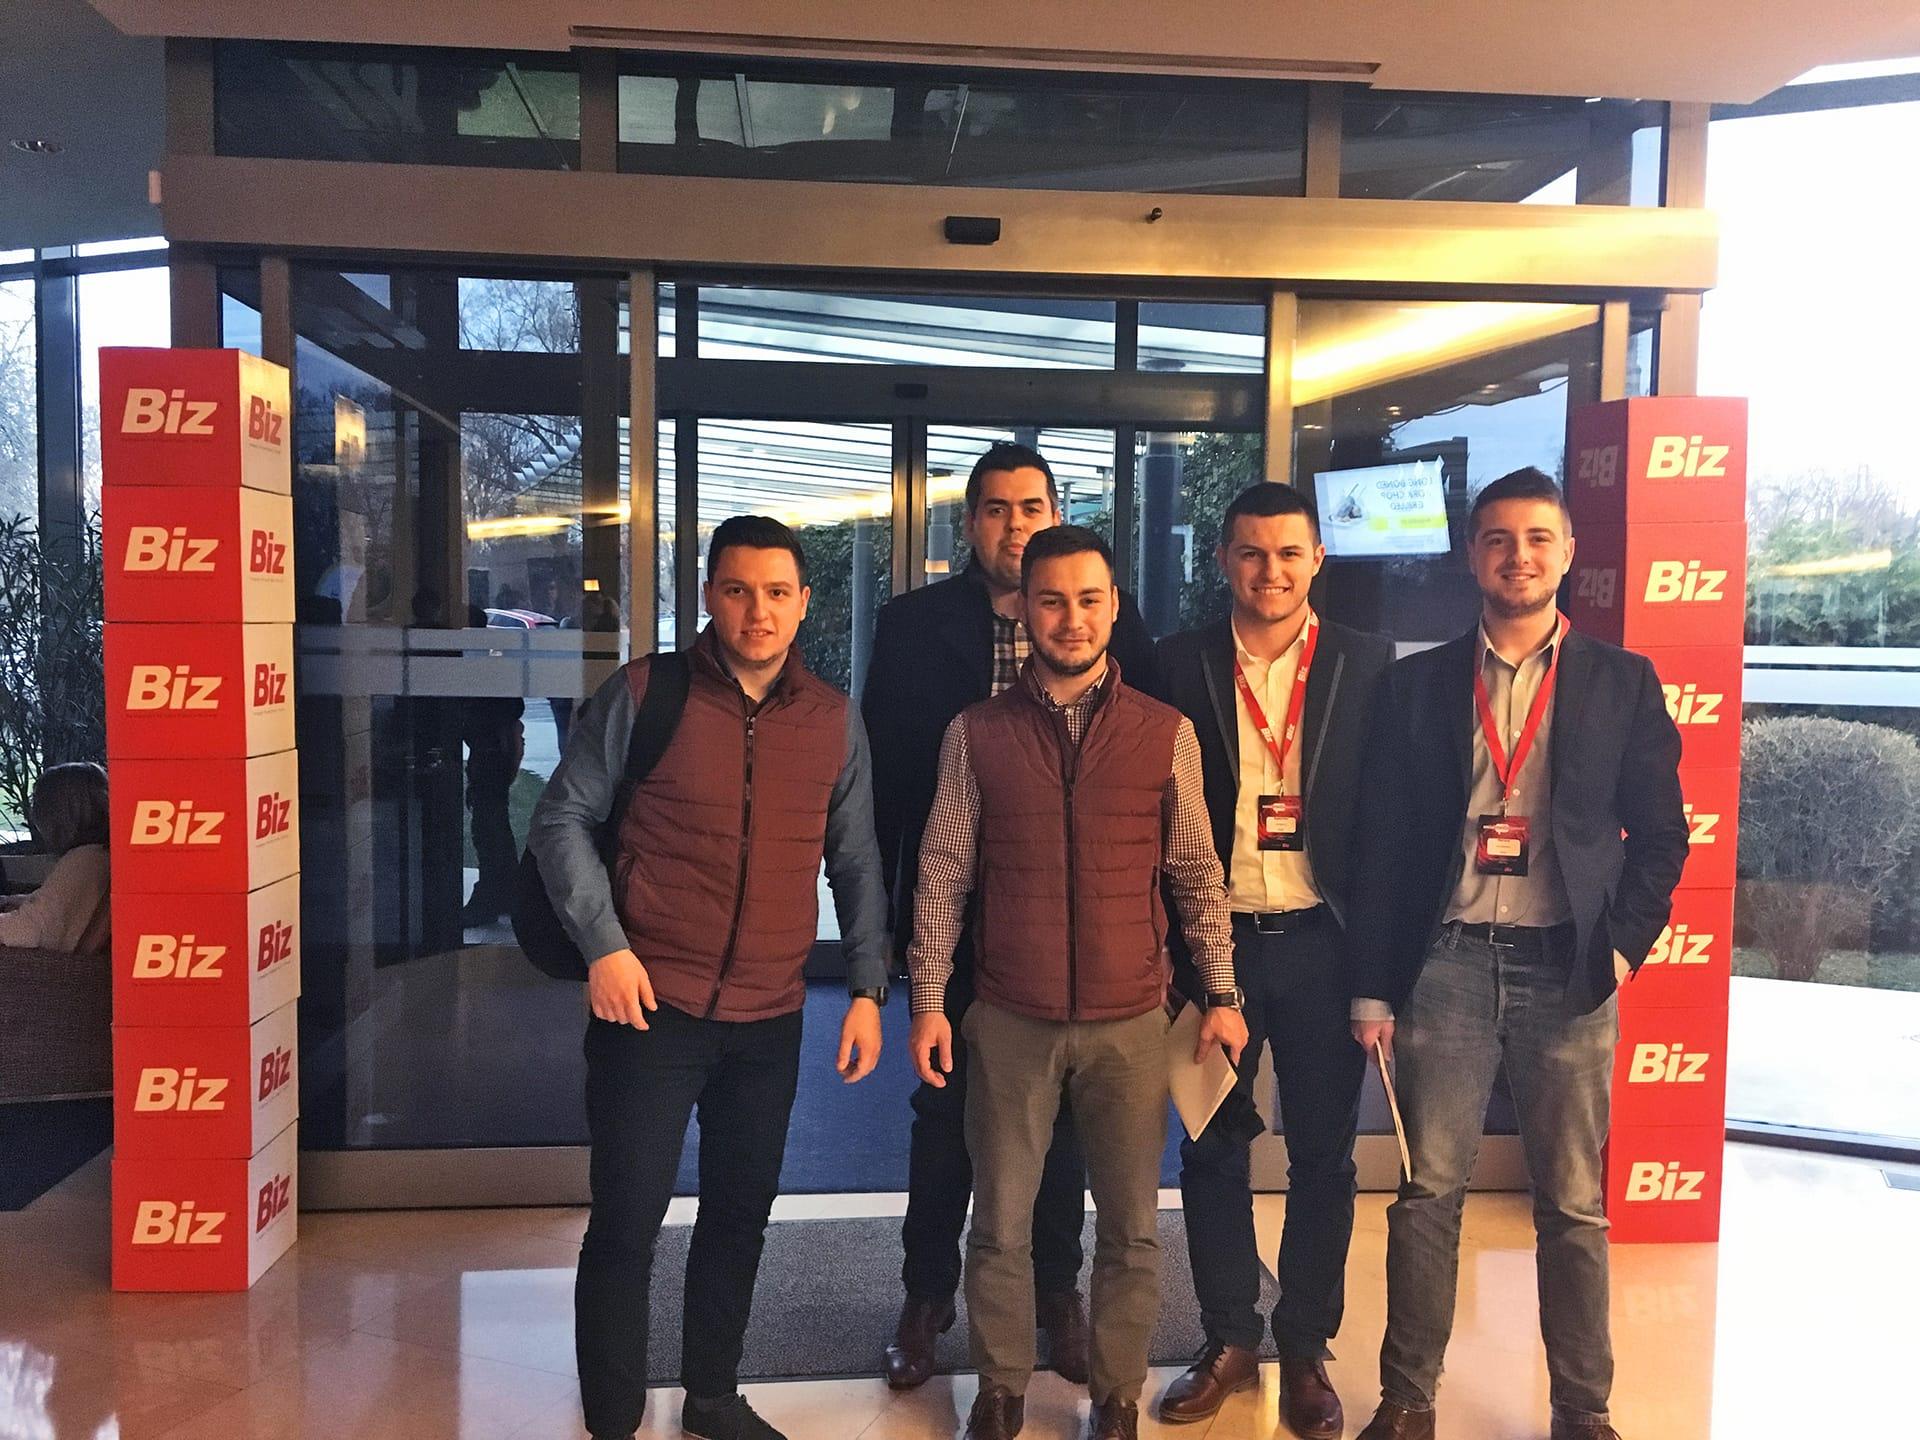 Am fost la Social Media Summit București